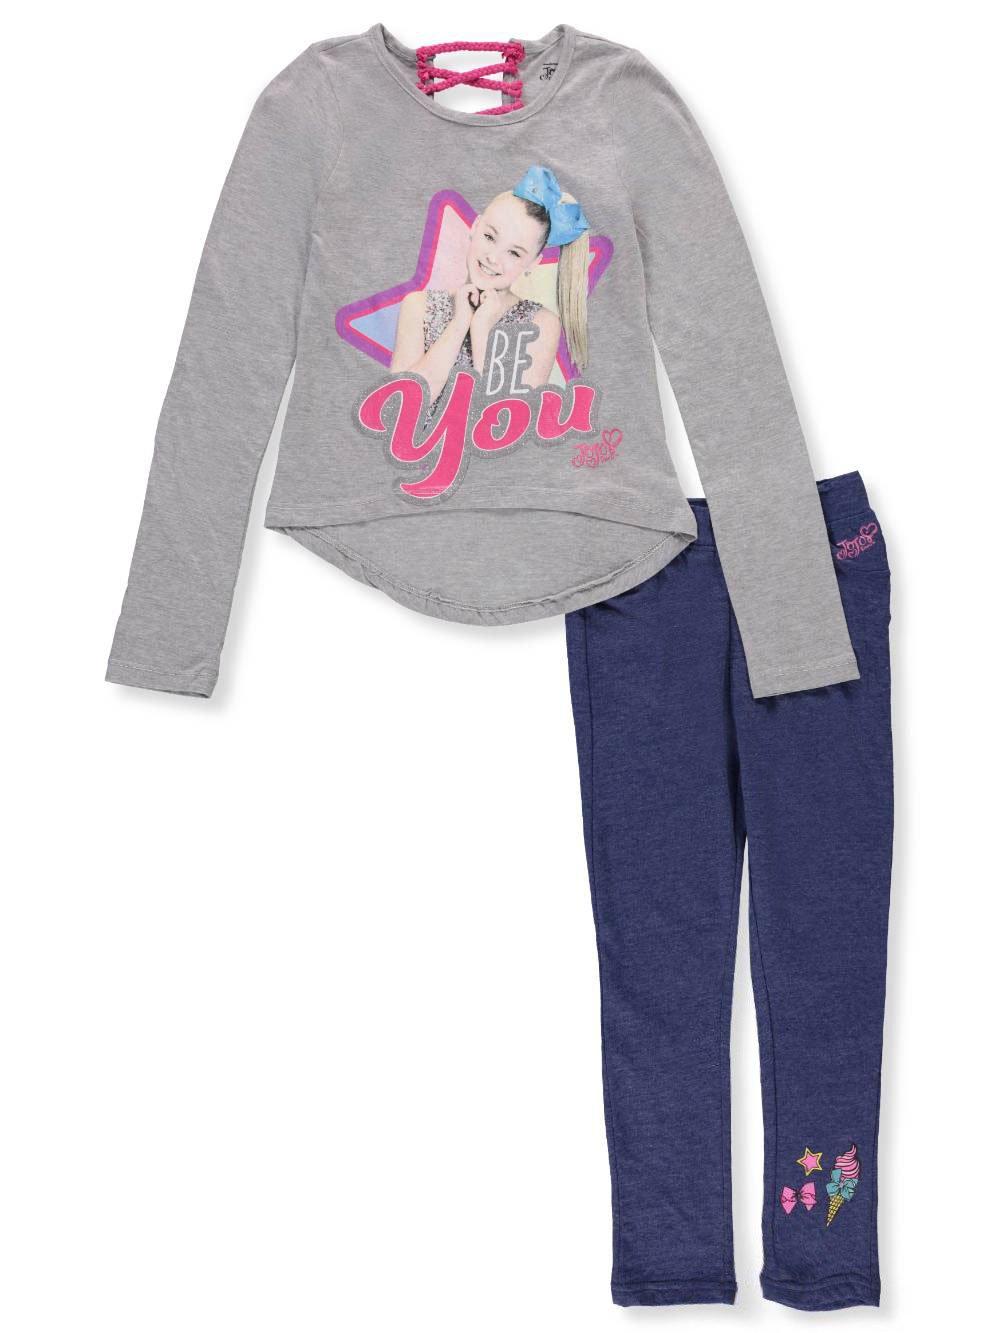 Jojo Siwa Girls' 2-Piece Pants Set Outfit